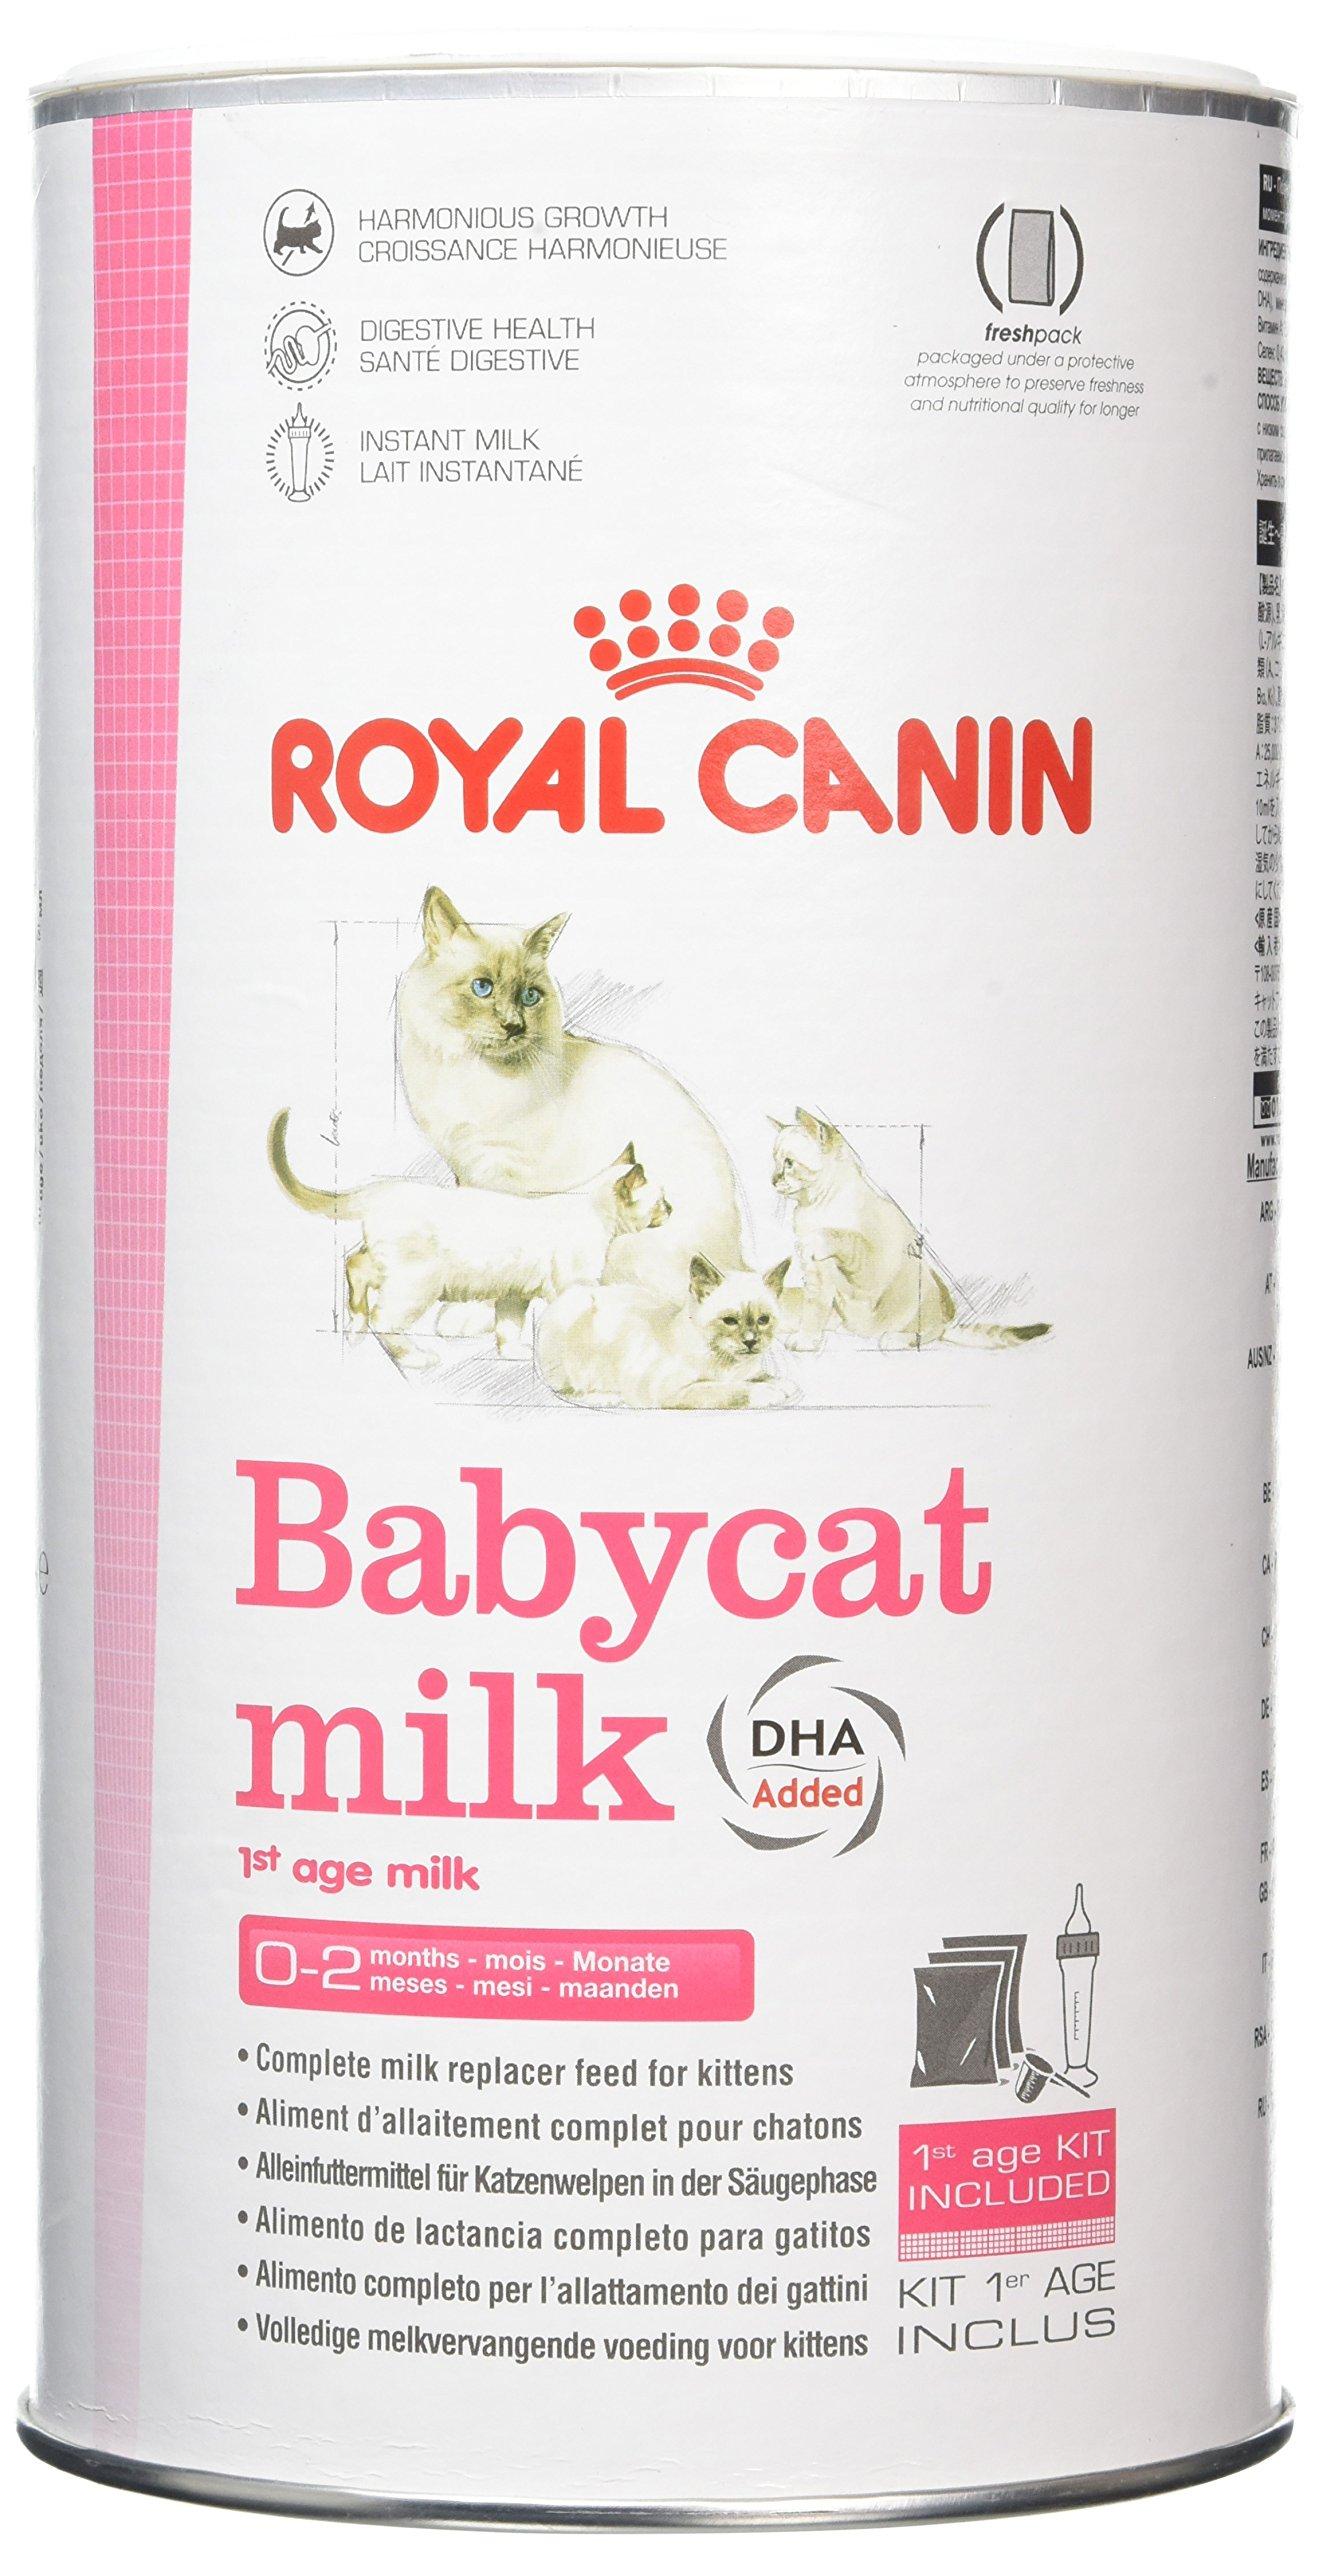 Royal Canin Baby Cat Milk 300 G Buy Online In India At Desertcart